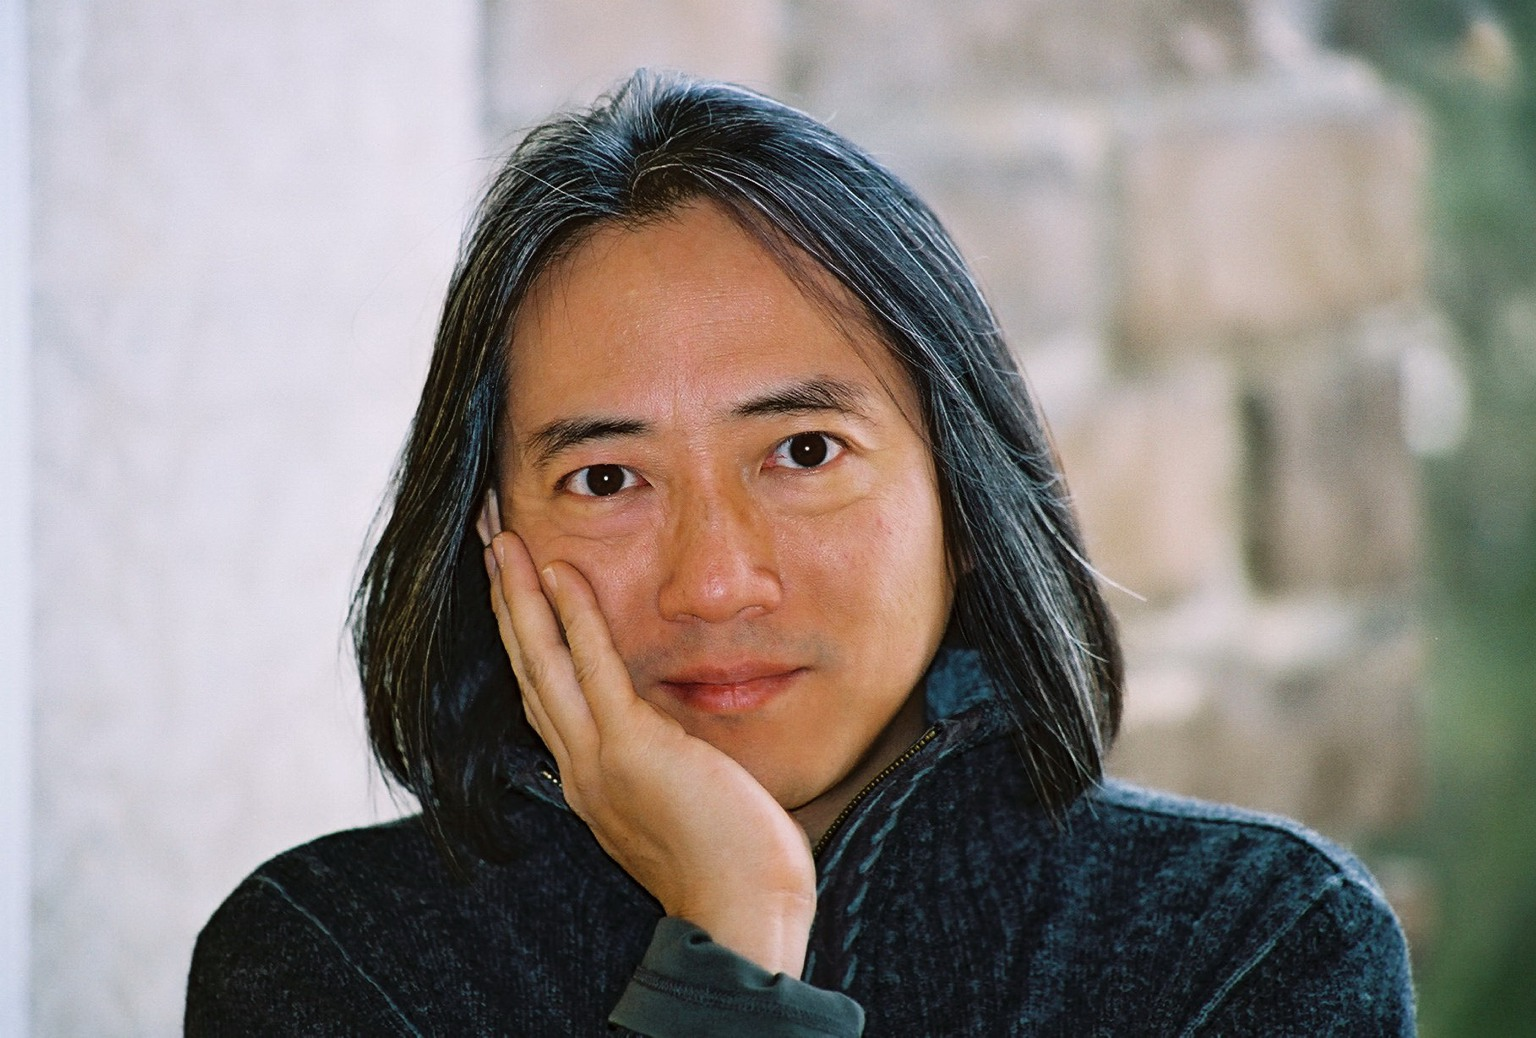 Hong-Kuan Chen  The Juilliard School; Yale School of Music  茱莉亚,耶鲁音乐学院教授